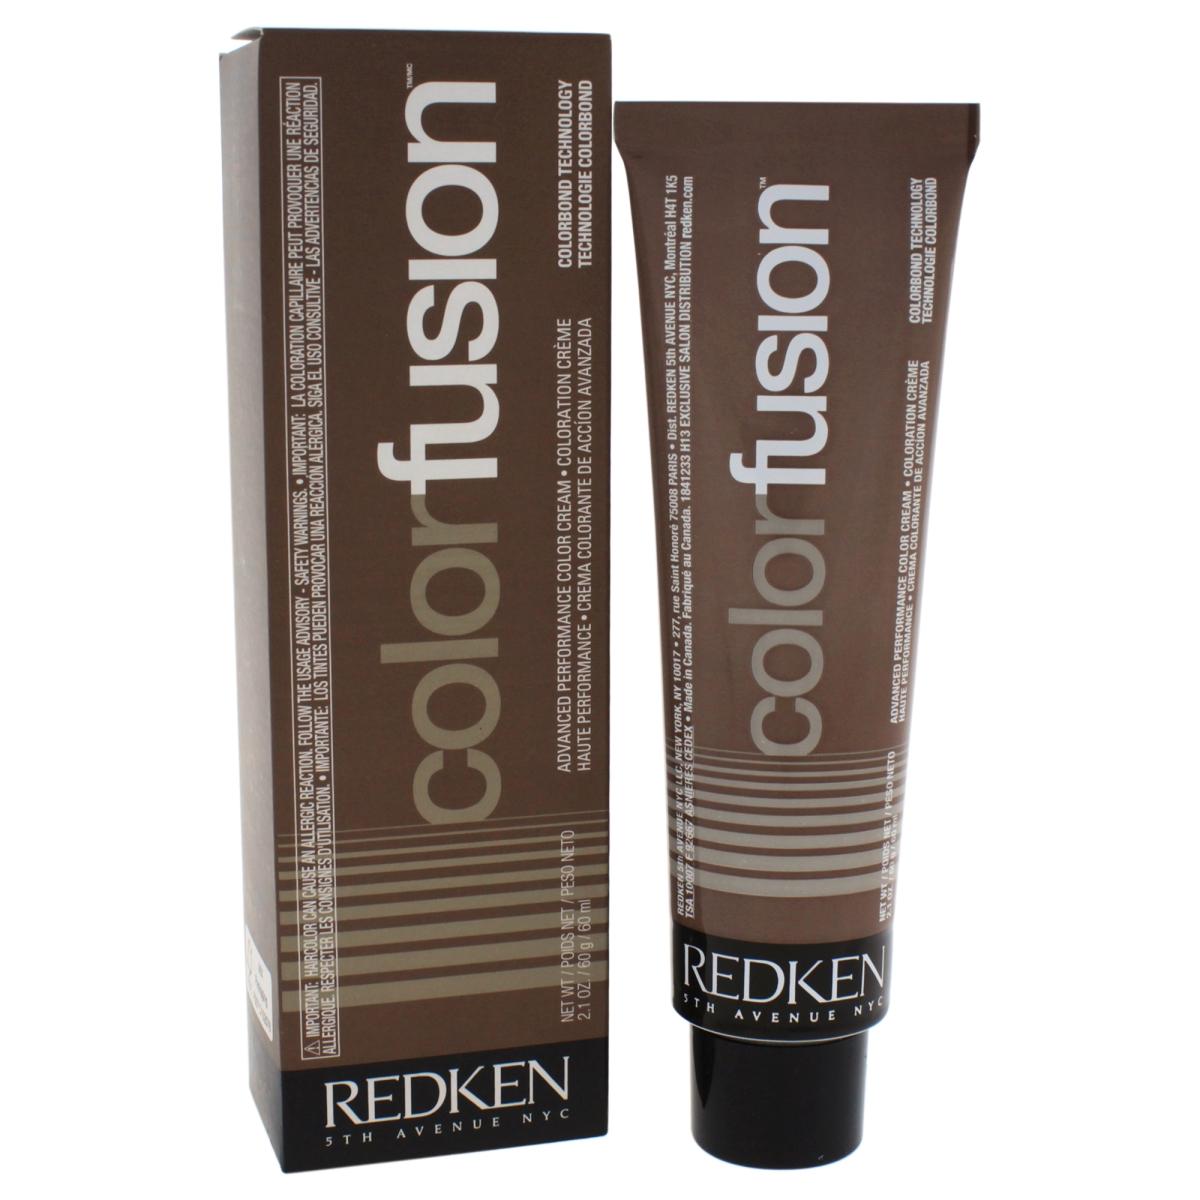 Redken U-HC-11731 2.1 oz Color Fusion Cream Natural Balance No. 9 Hair Color for Unisex Ash Violet